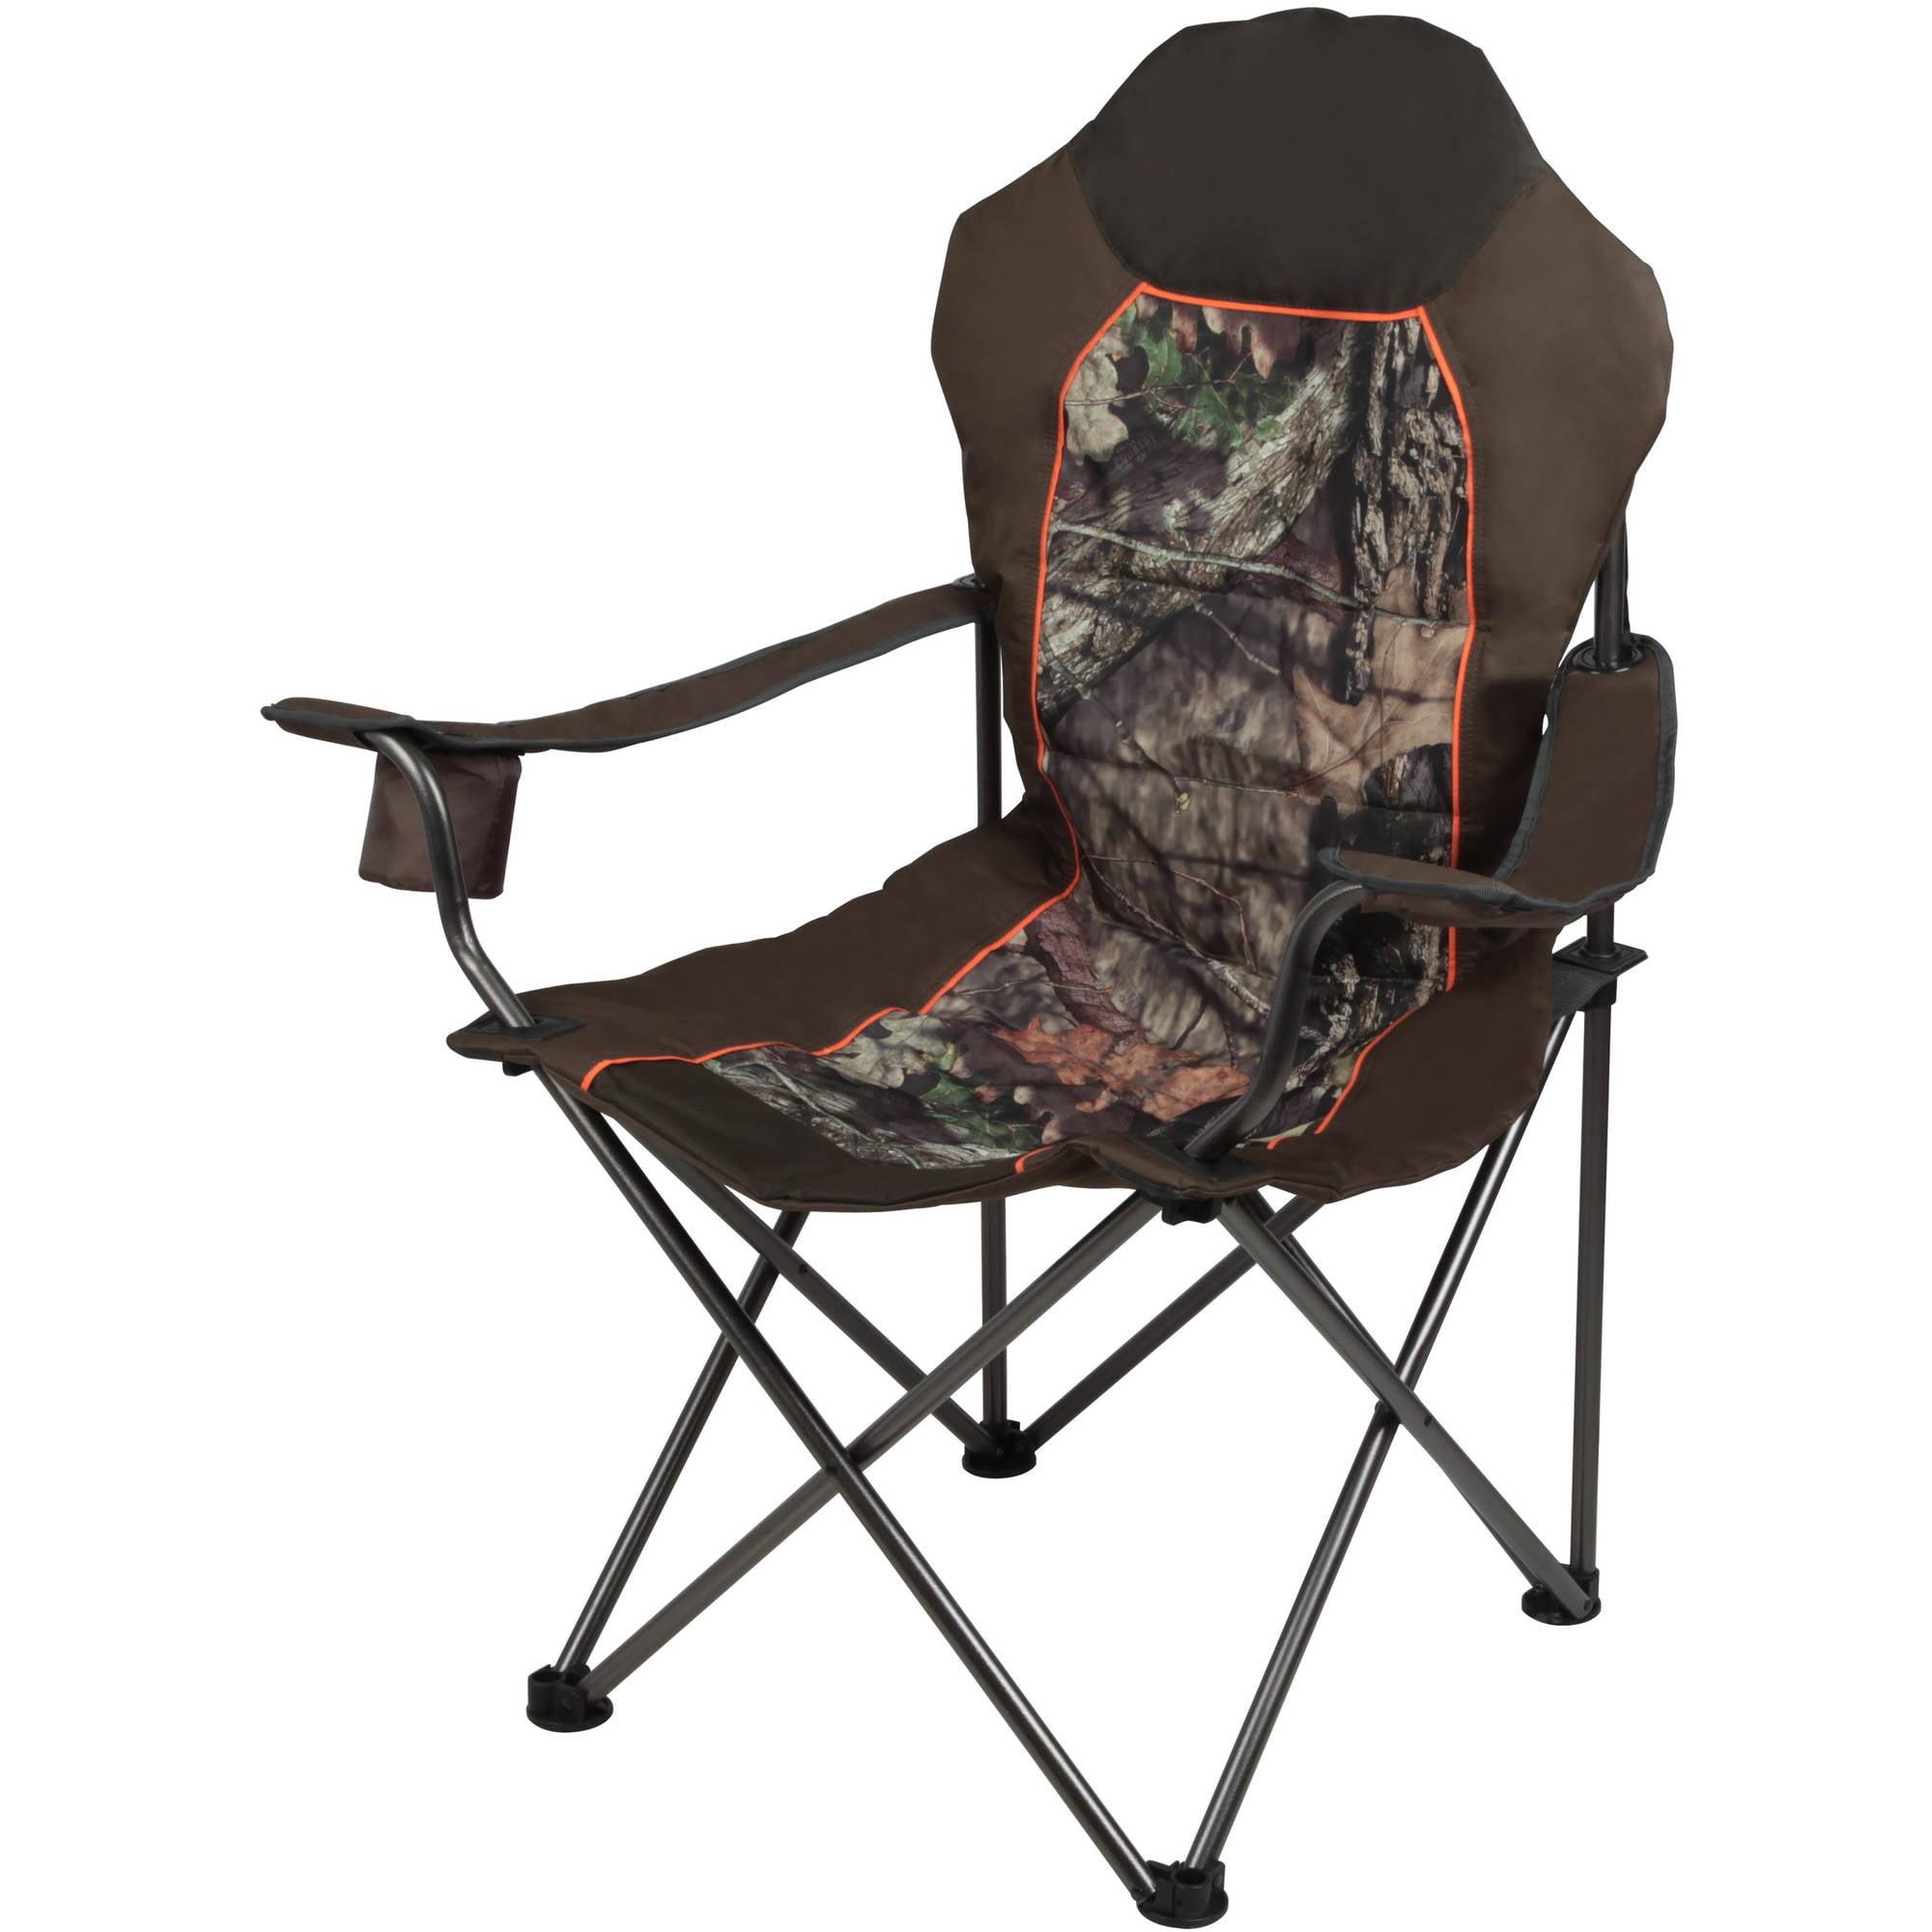 Oak Chairs At Walmart